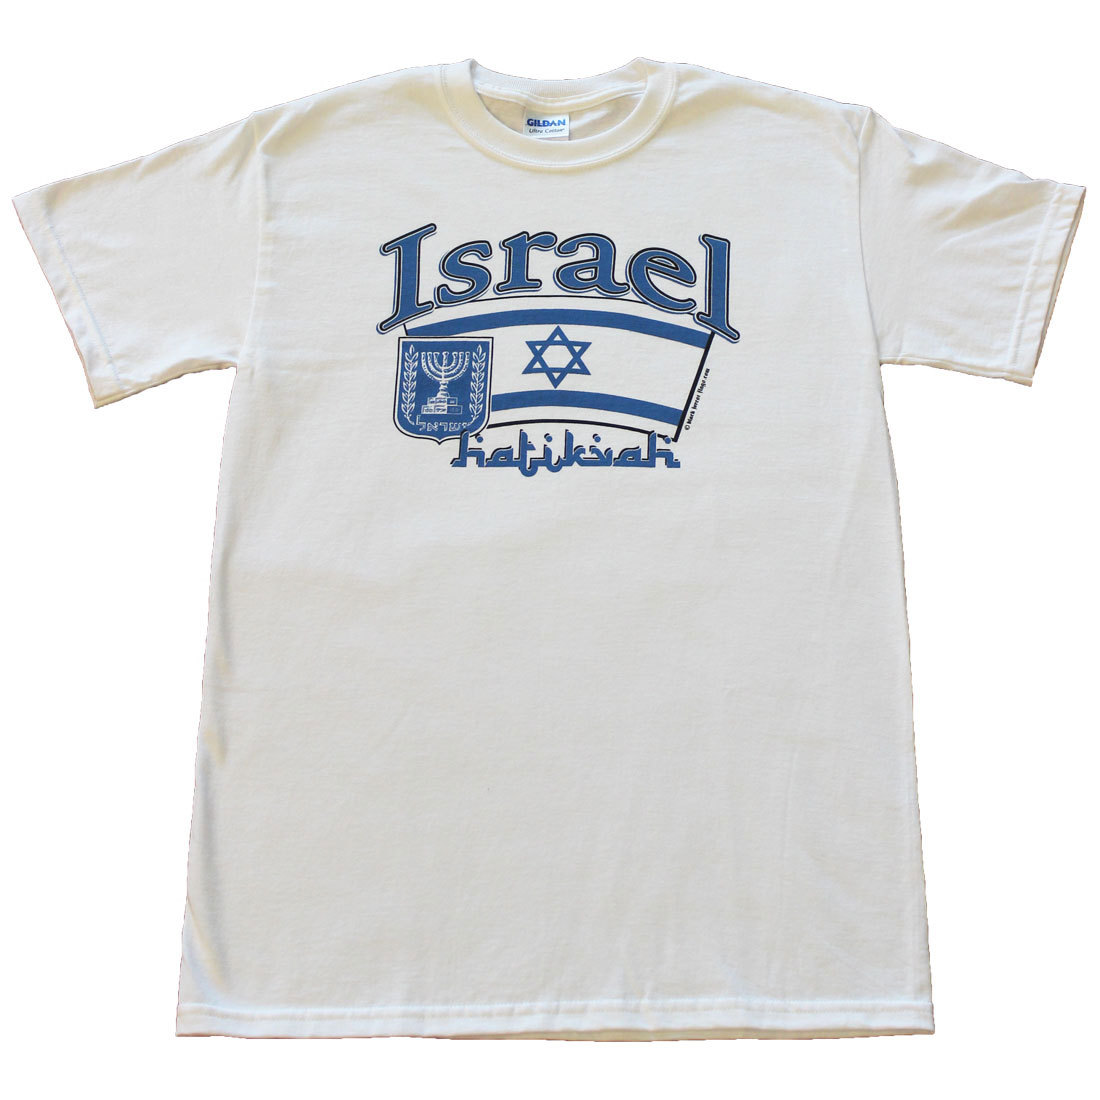 Israel2 3